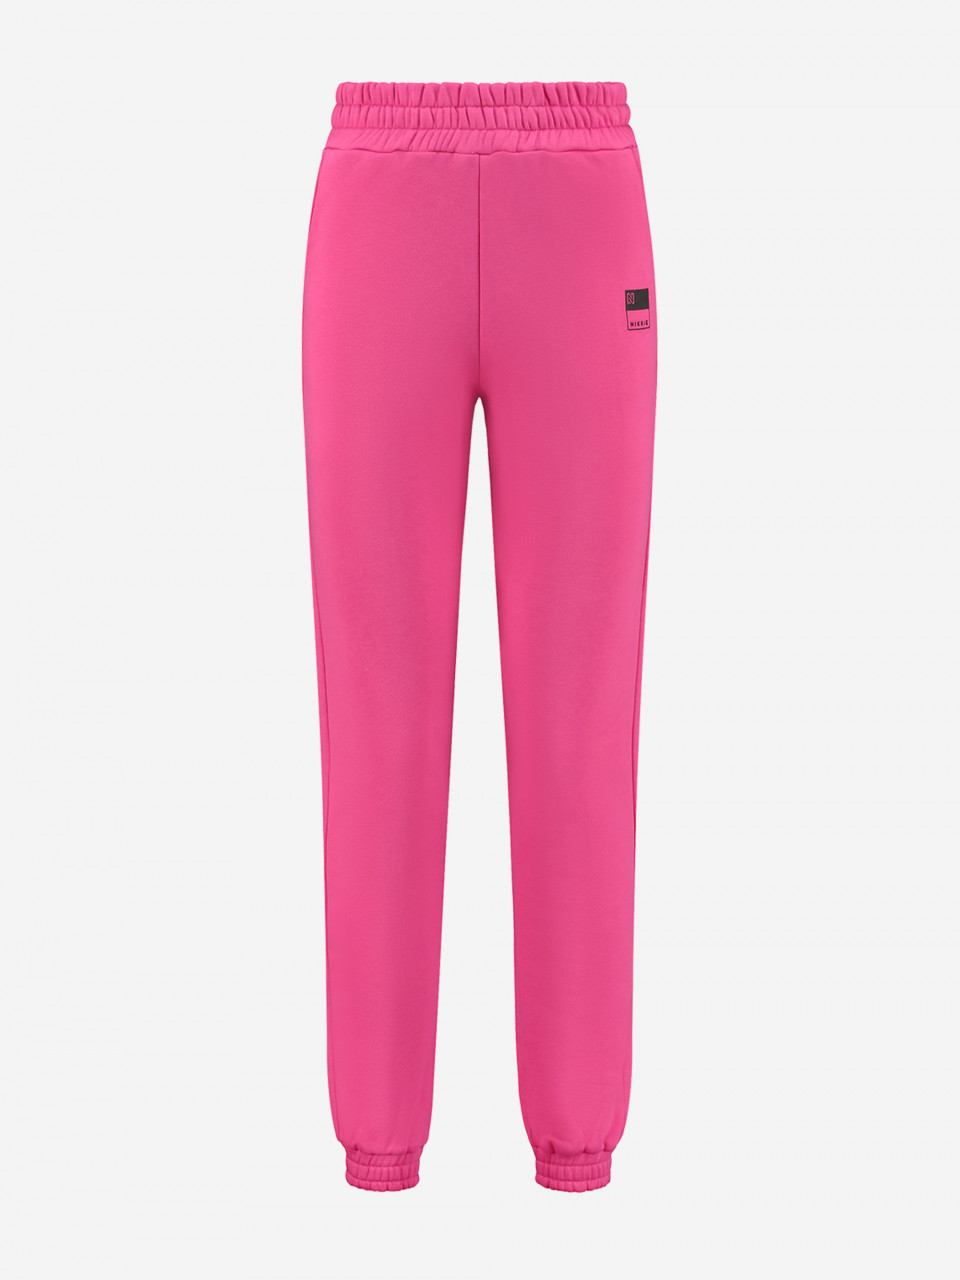 NIKKIE LOUNGEWEAR SWEATPANTS MET NIKKIE-LOGO HIGH WAIST SWEATPANTS Pink